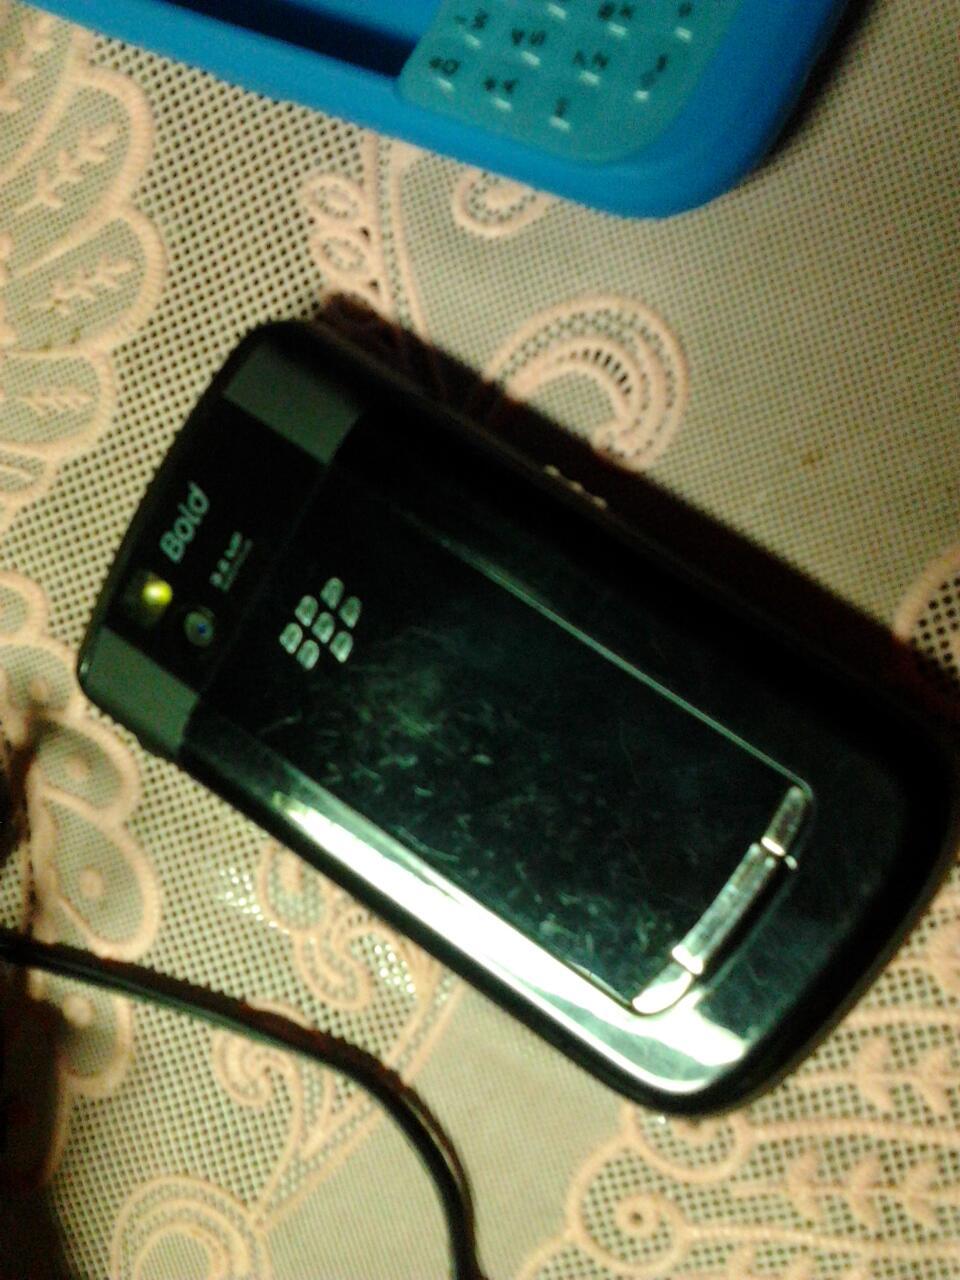 blackberry essex 9650 lengkap ex.garansi